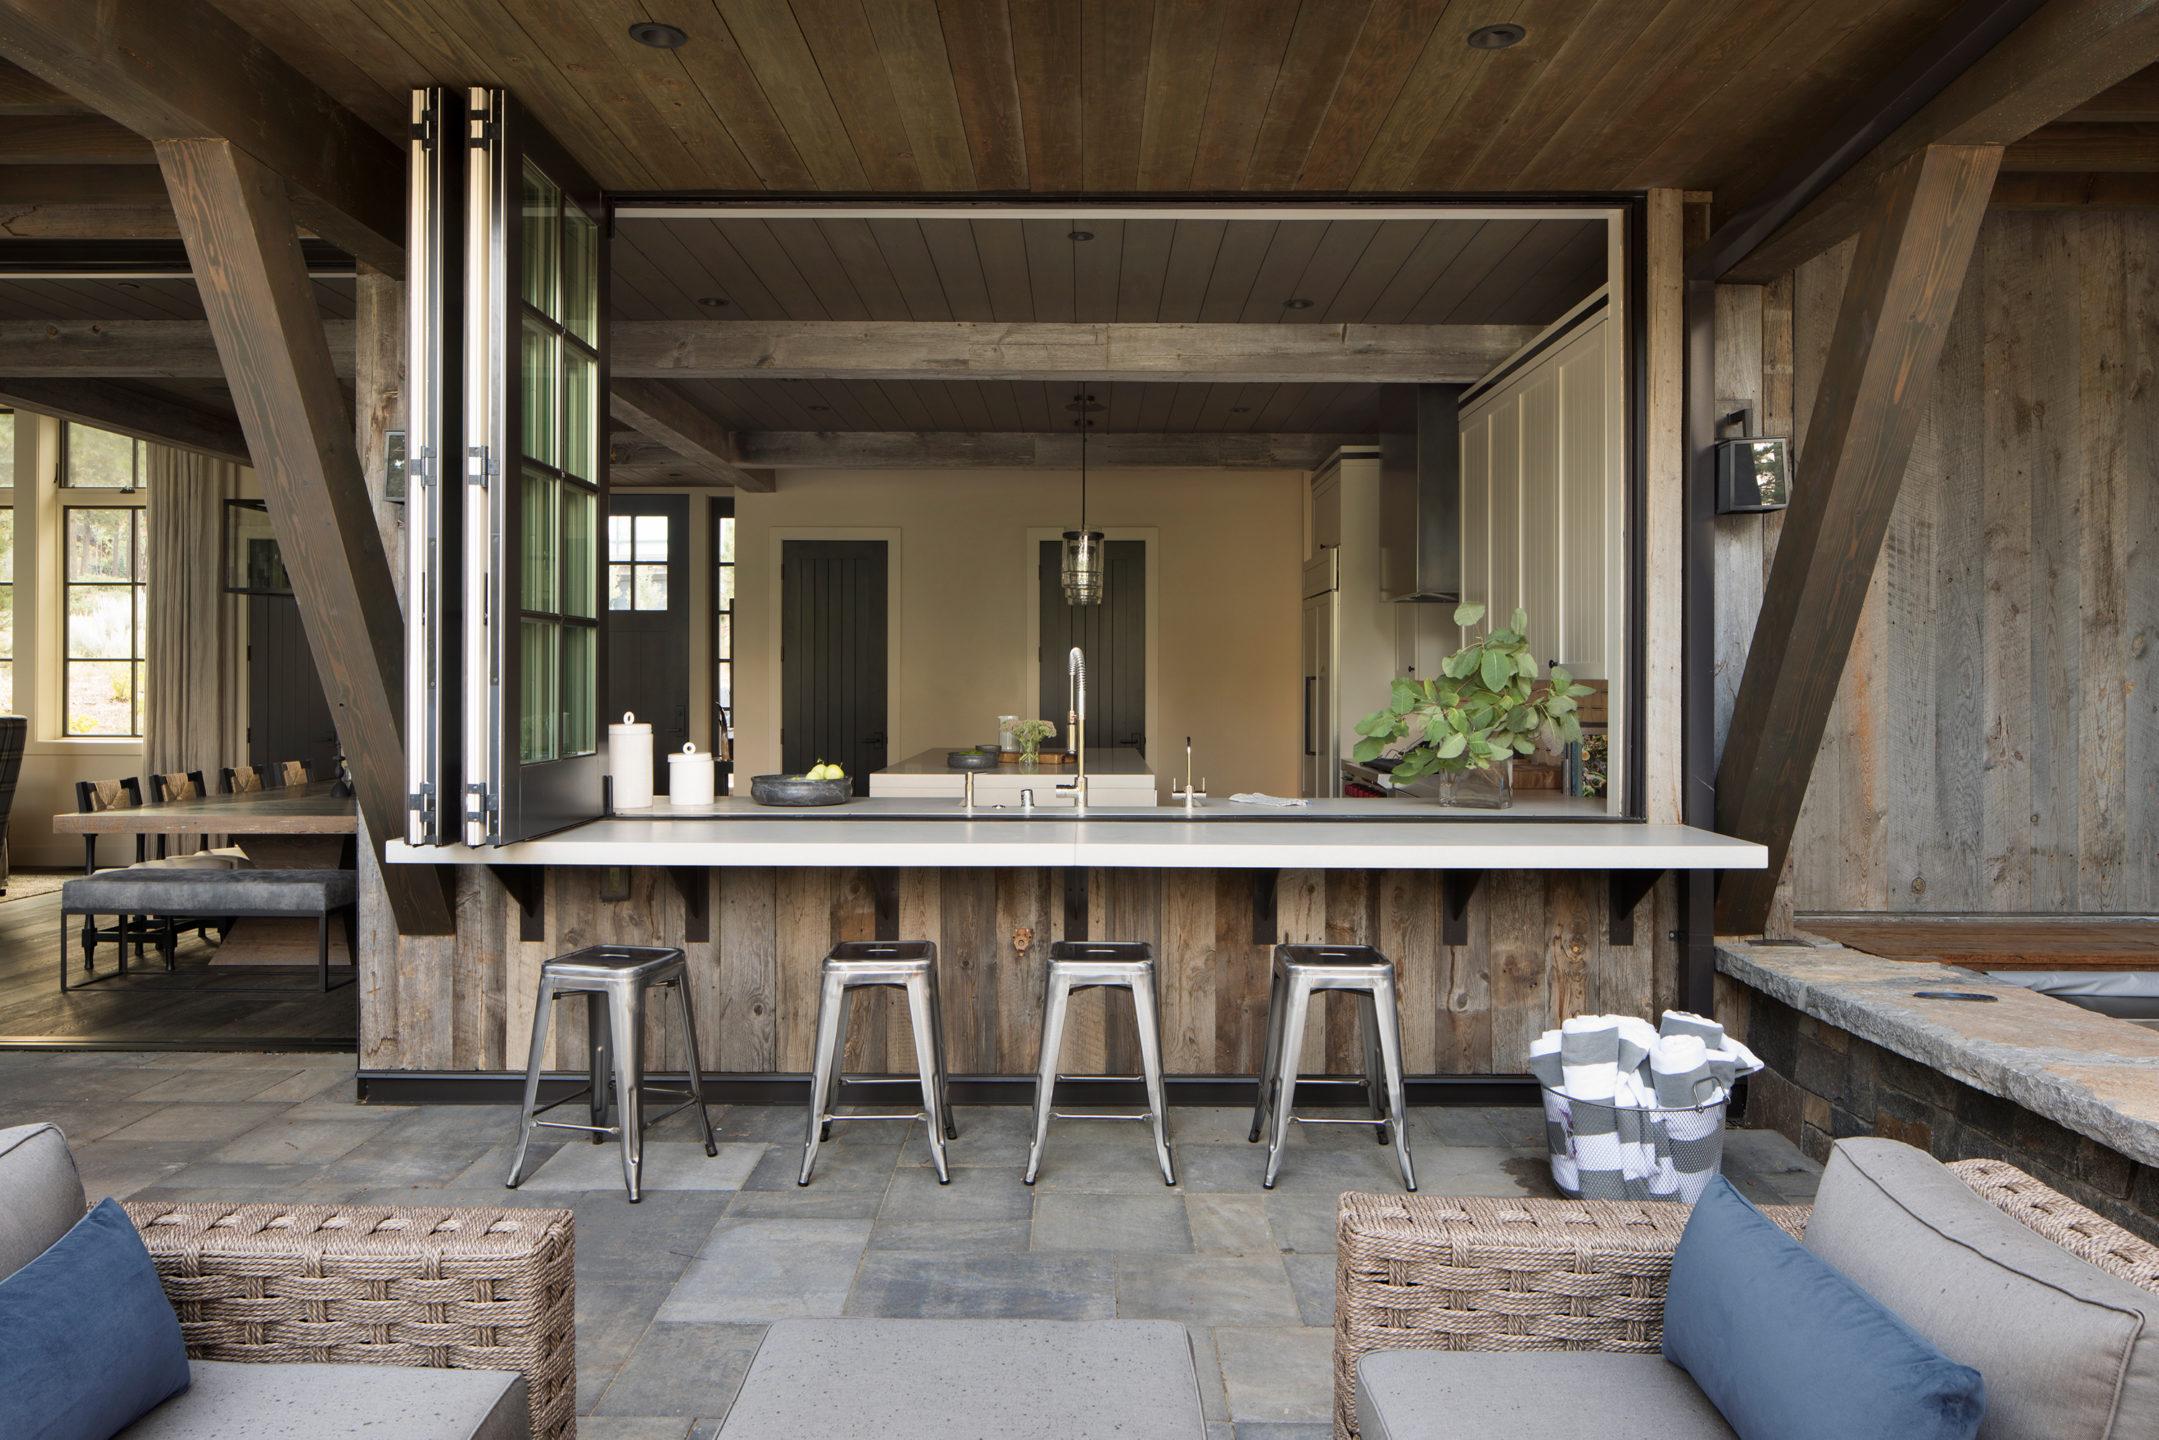 Jennifer_robins_interiors_projects_martis_camp_Del_Grand_33_HR_exterior_indoor_view